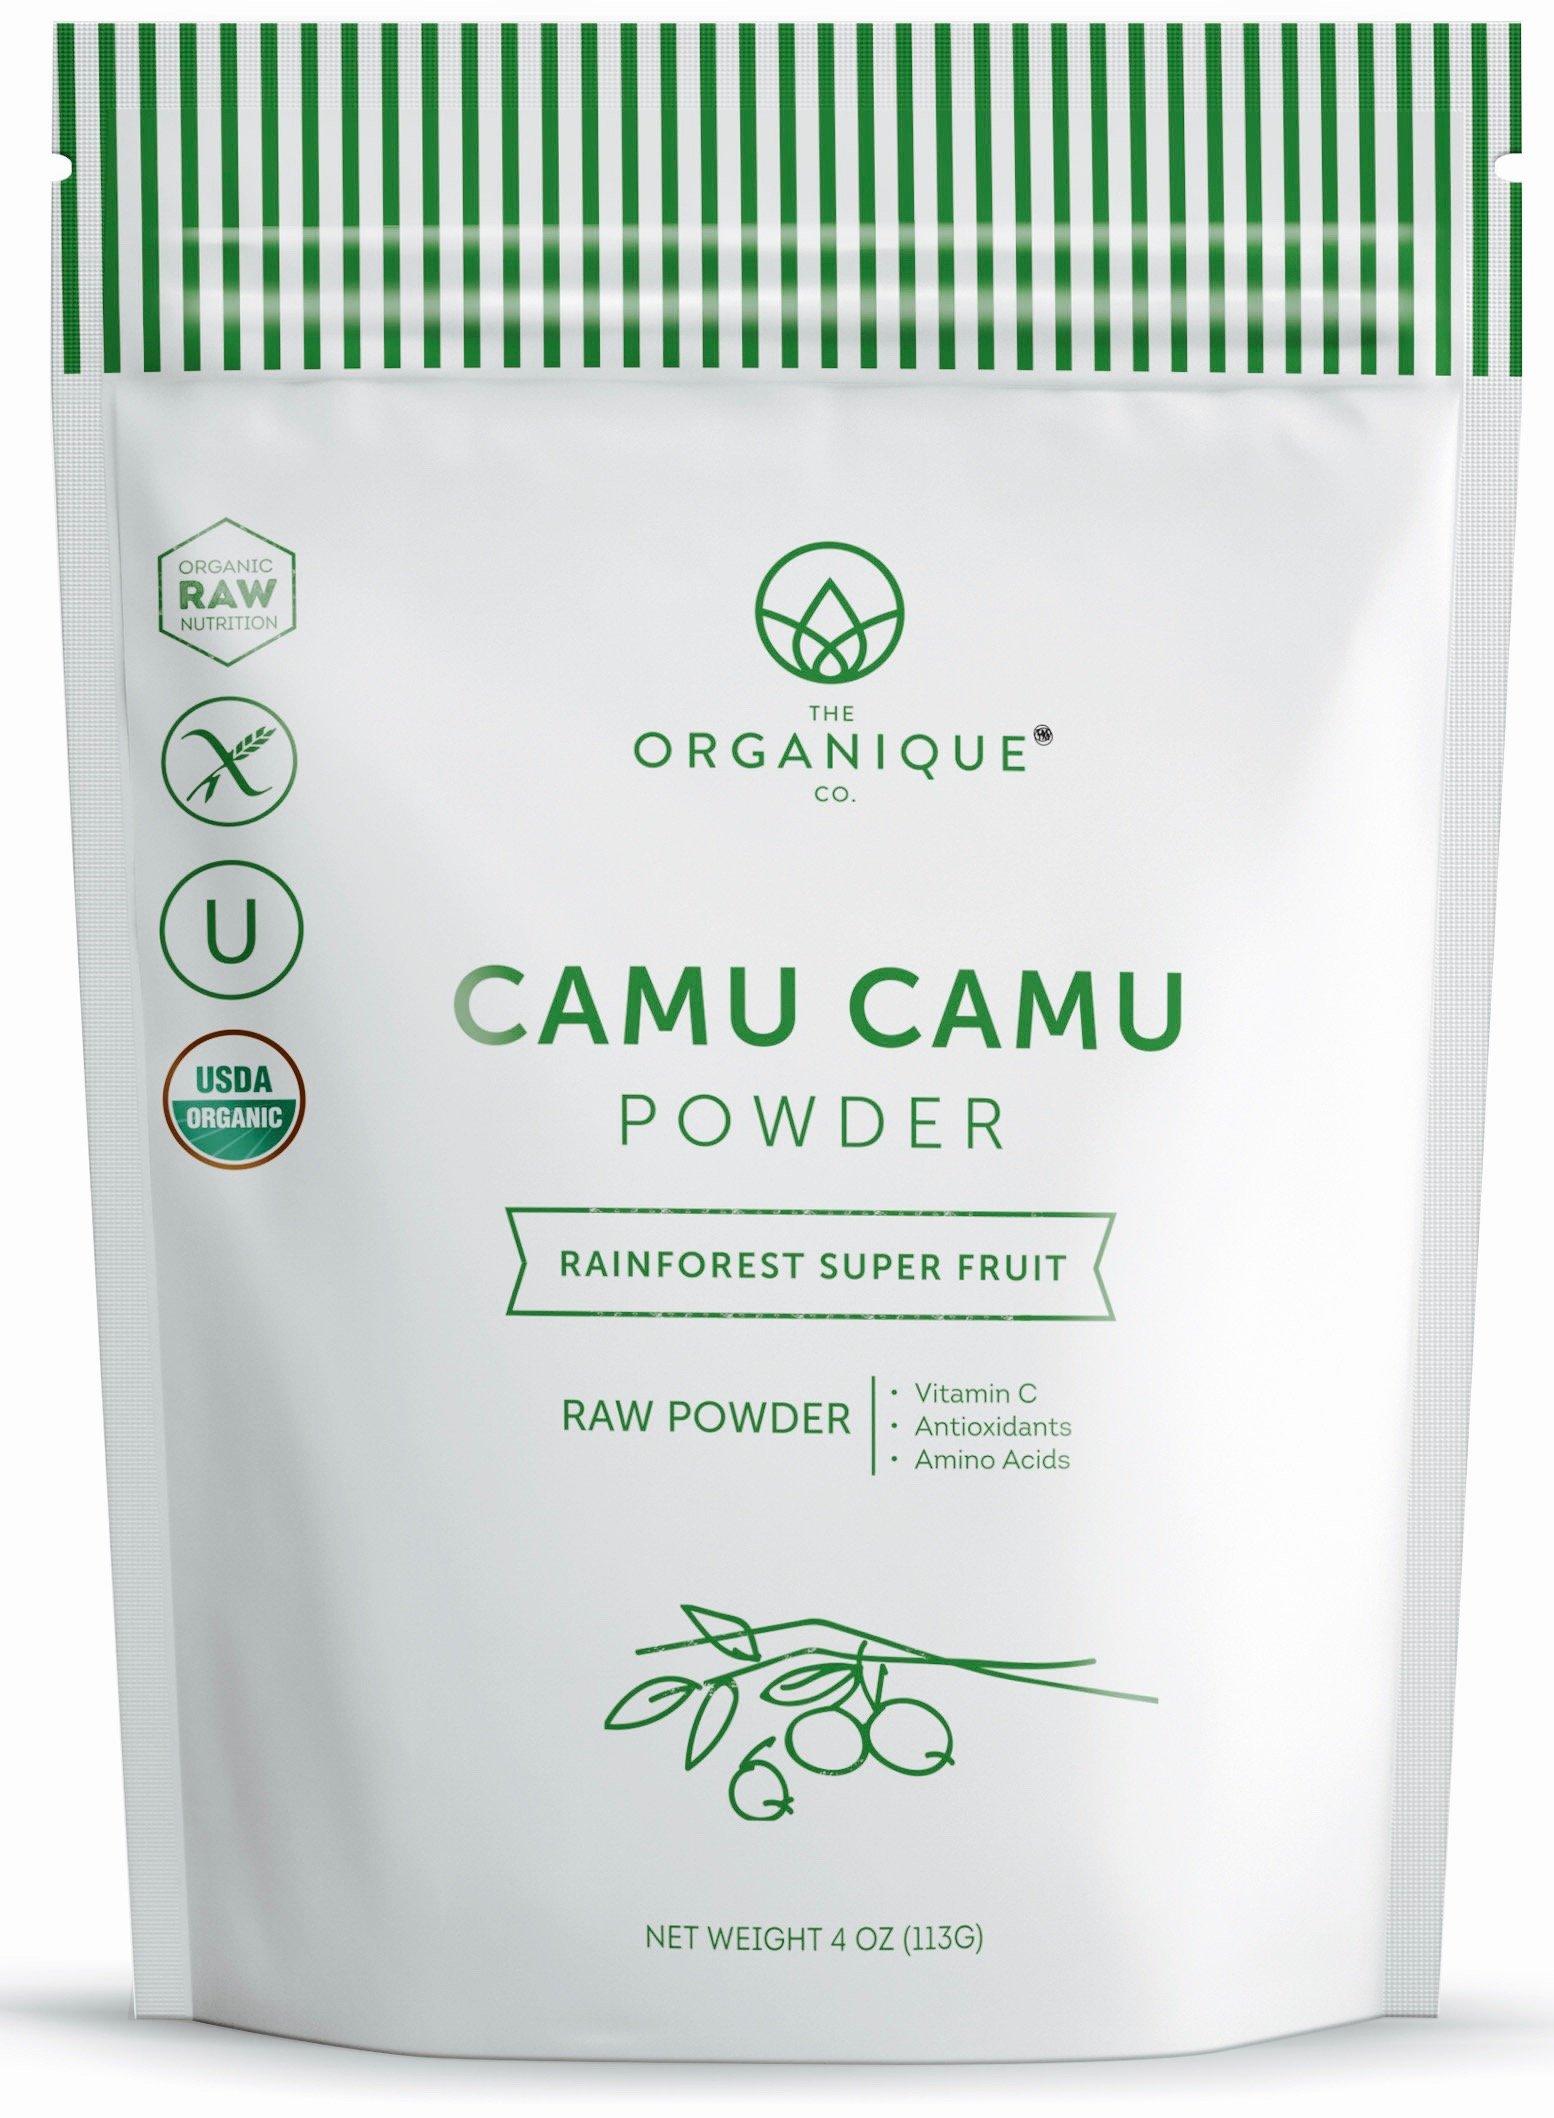 Camu Camu Powder - Certified Organic, Raw Natural Whole Food Vitamin C - Minerals, Antioxidants, Real Fruit, Non-GMO, Vegan, Gluten Free, Paleo - by The Organique Co. 4oz